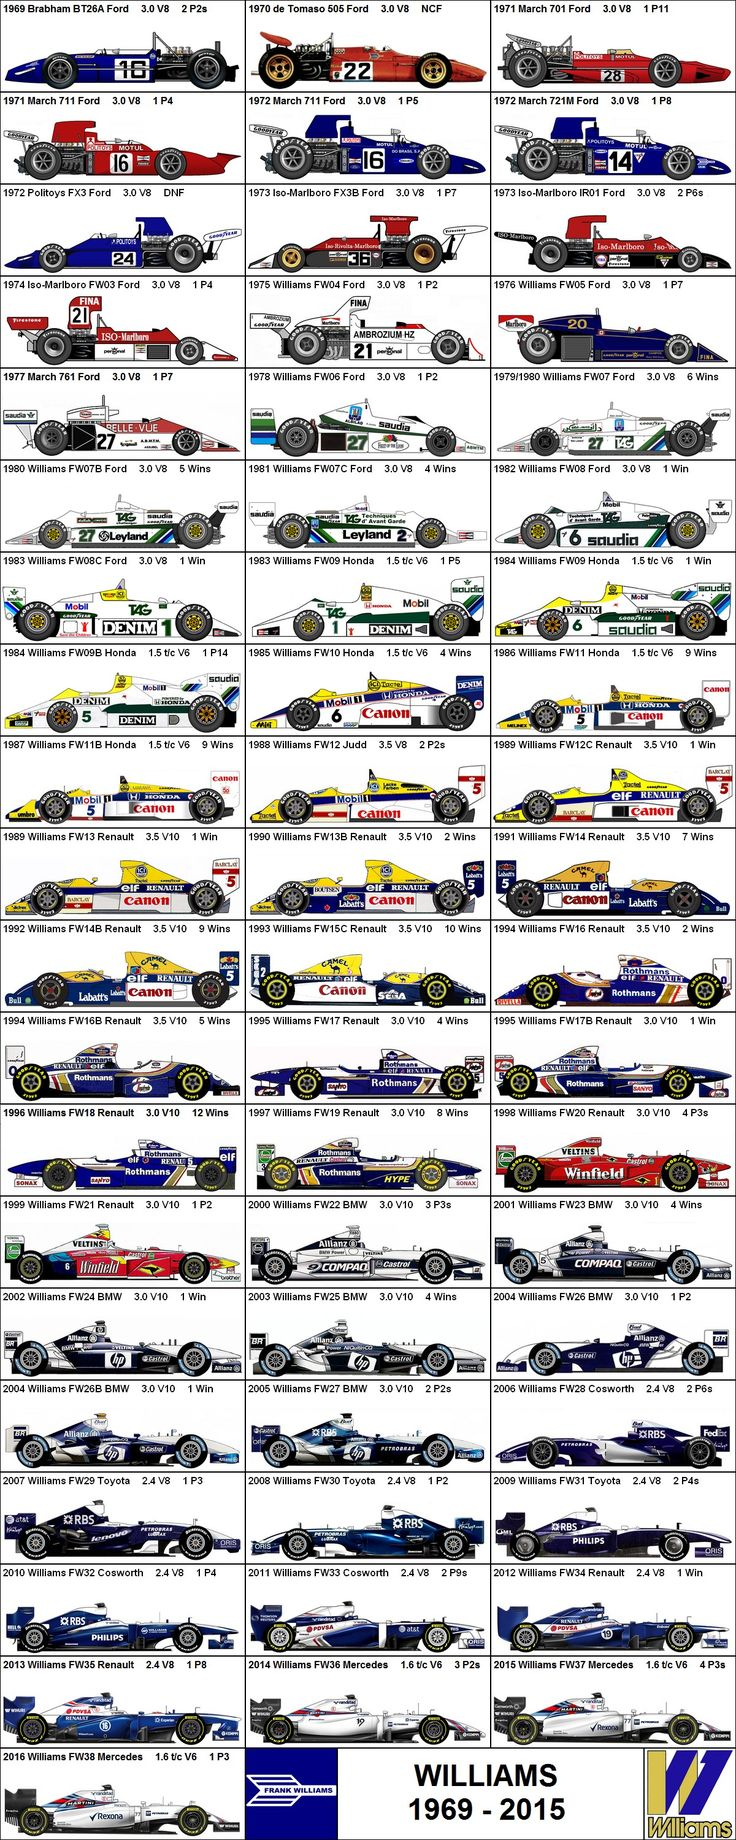 Formula One Grand Prix Williams 1969-2015